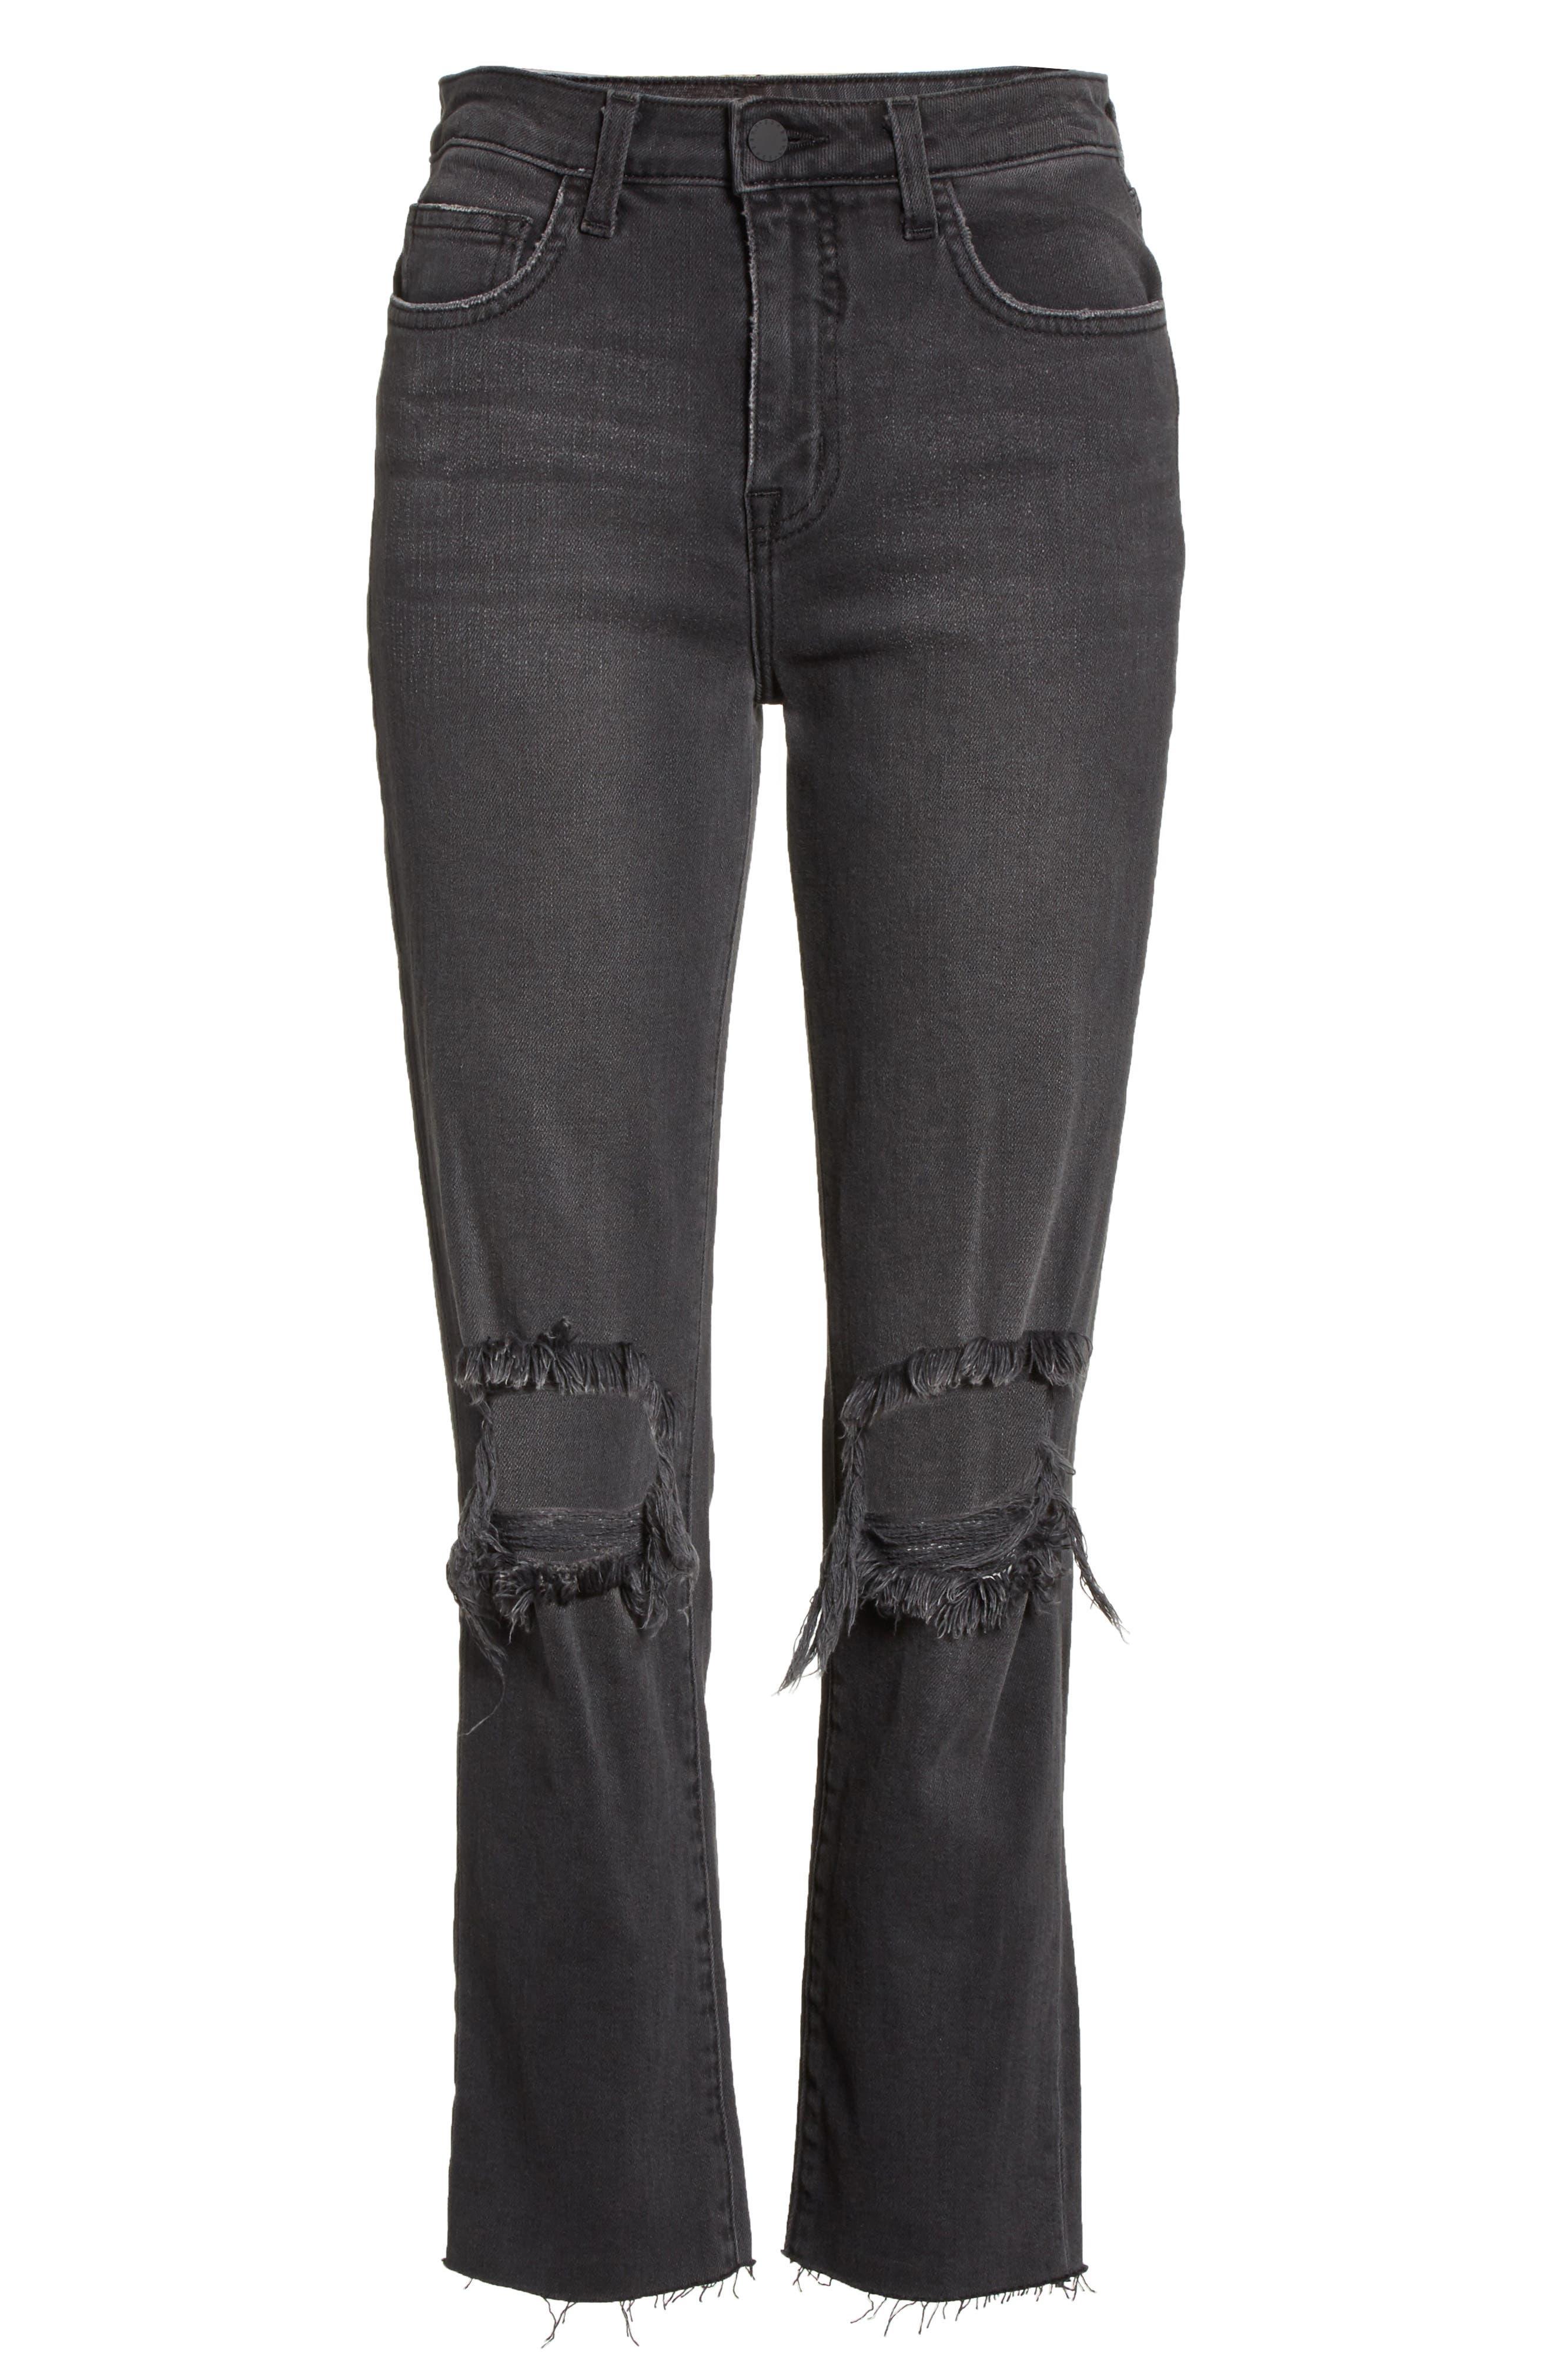 Audrina Ripped Straight Leg Jeans,                             Alternate thumbnail 7, color,                             Vintage Black Worn Destruct